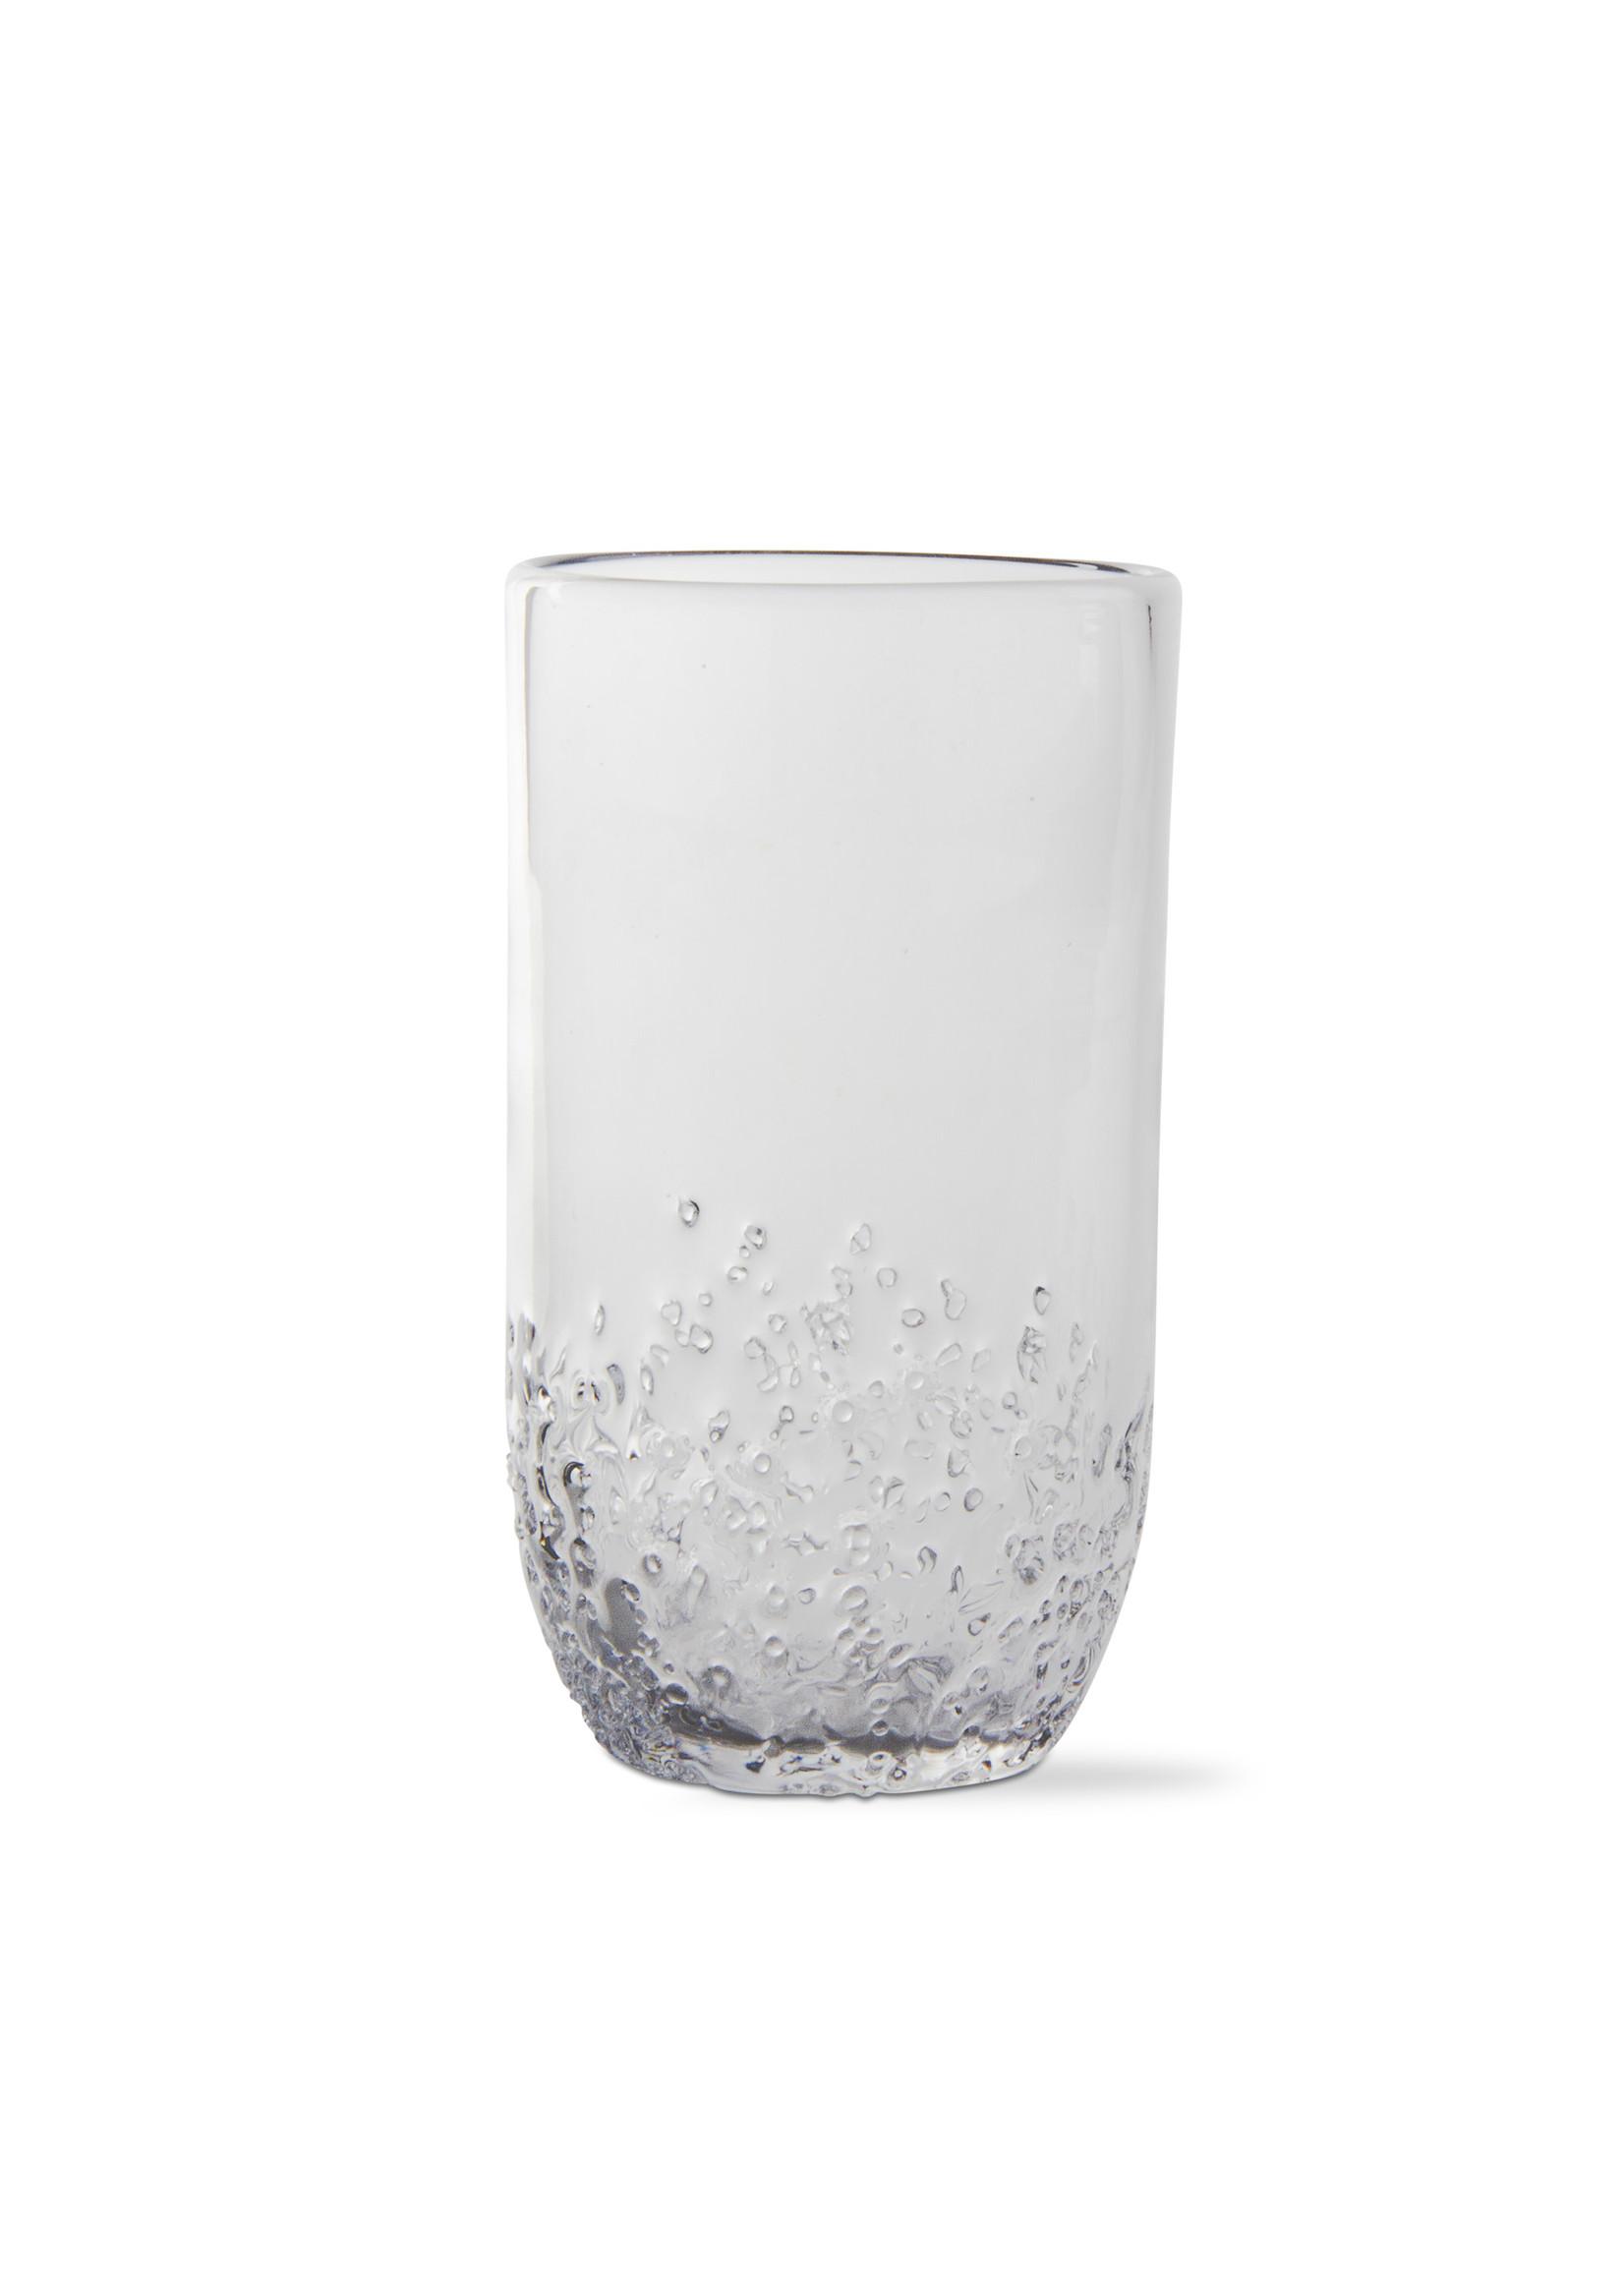 ICE TUMBLER GLASS